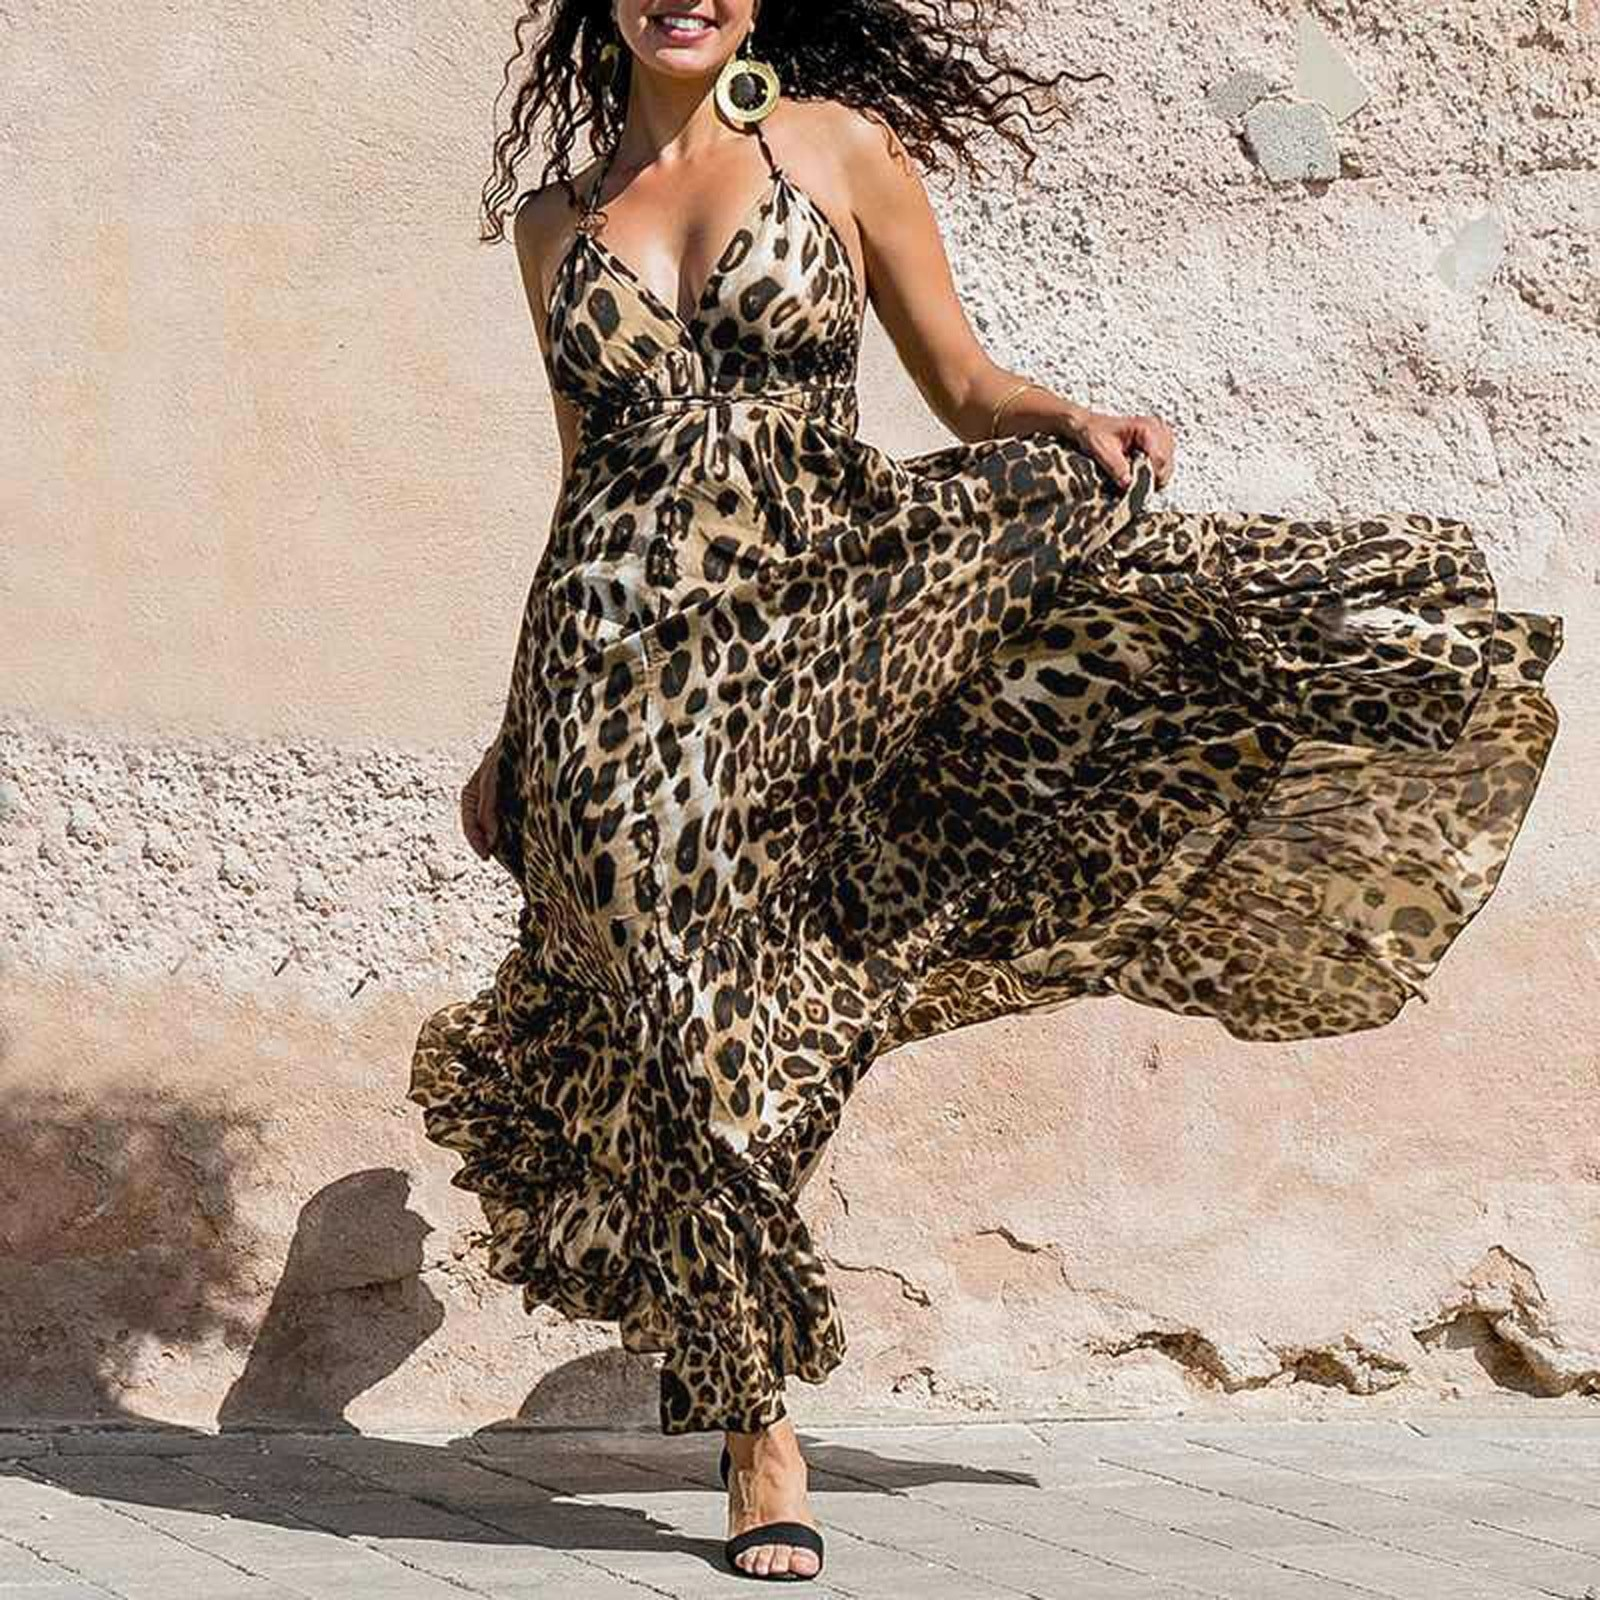 AliExpress - Women's Dress Leopard Printed V-Neck Sleeveless Sling Long Dress Summer Fashion Casual Ladies Sexy Tube Top Dresses 2021 New